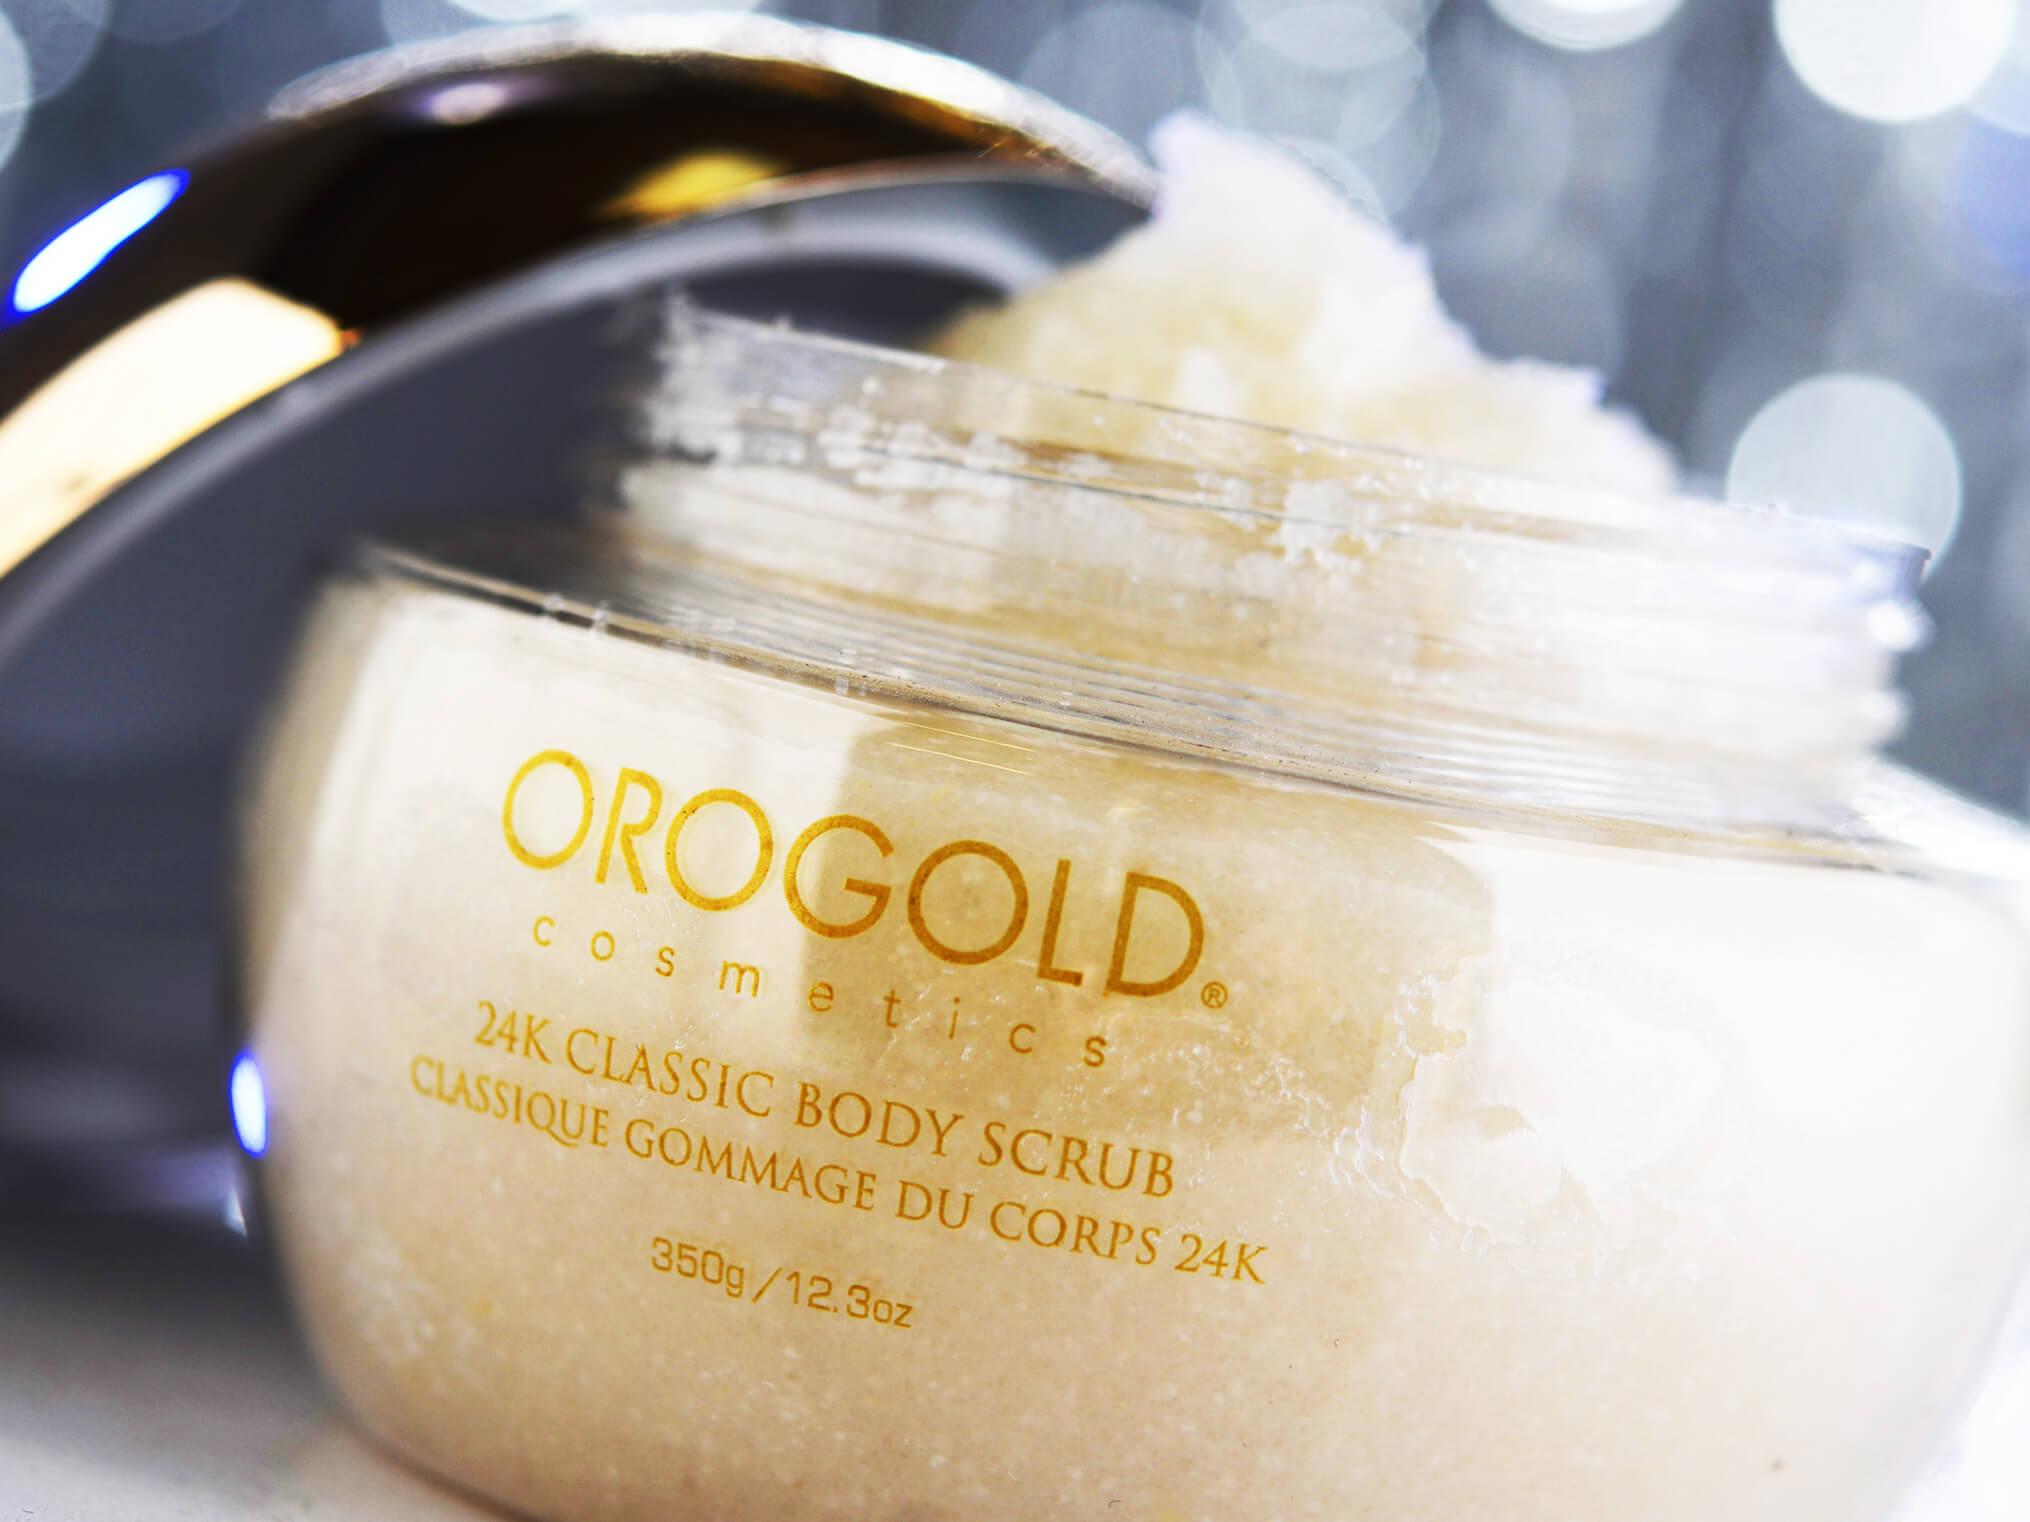 OROGOLD gold scrub for body